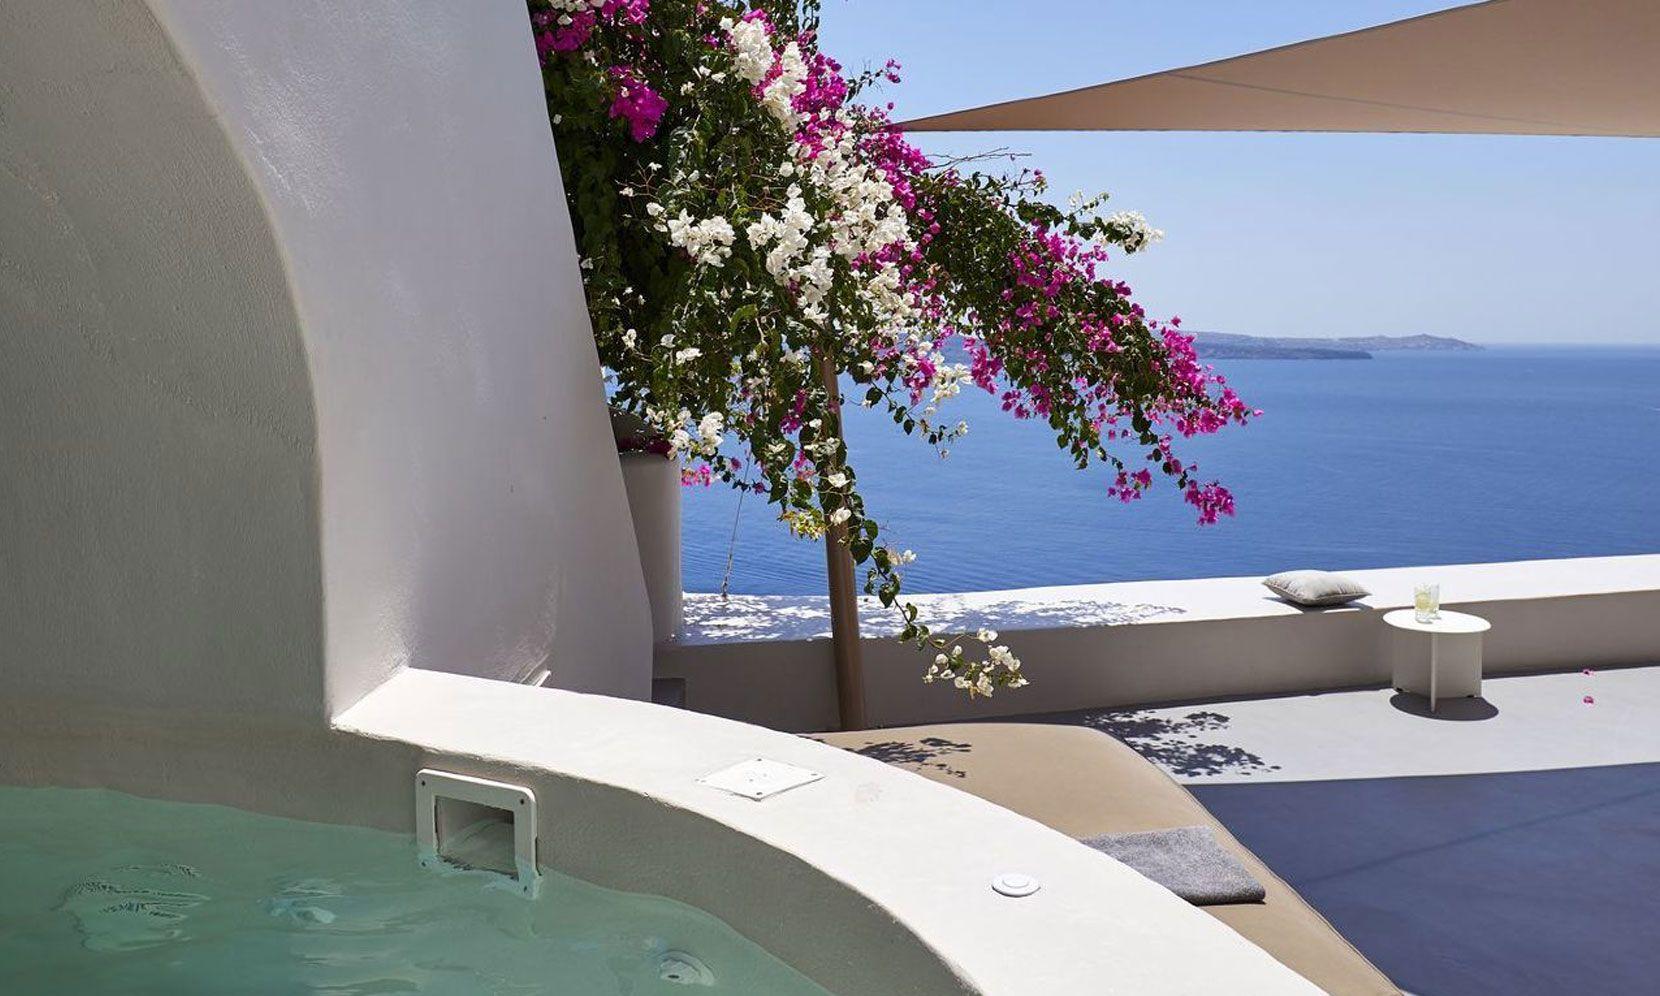 Santorini Villa Aoide 5 jumbotron image